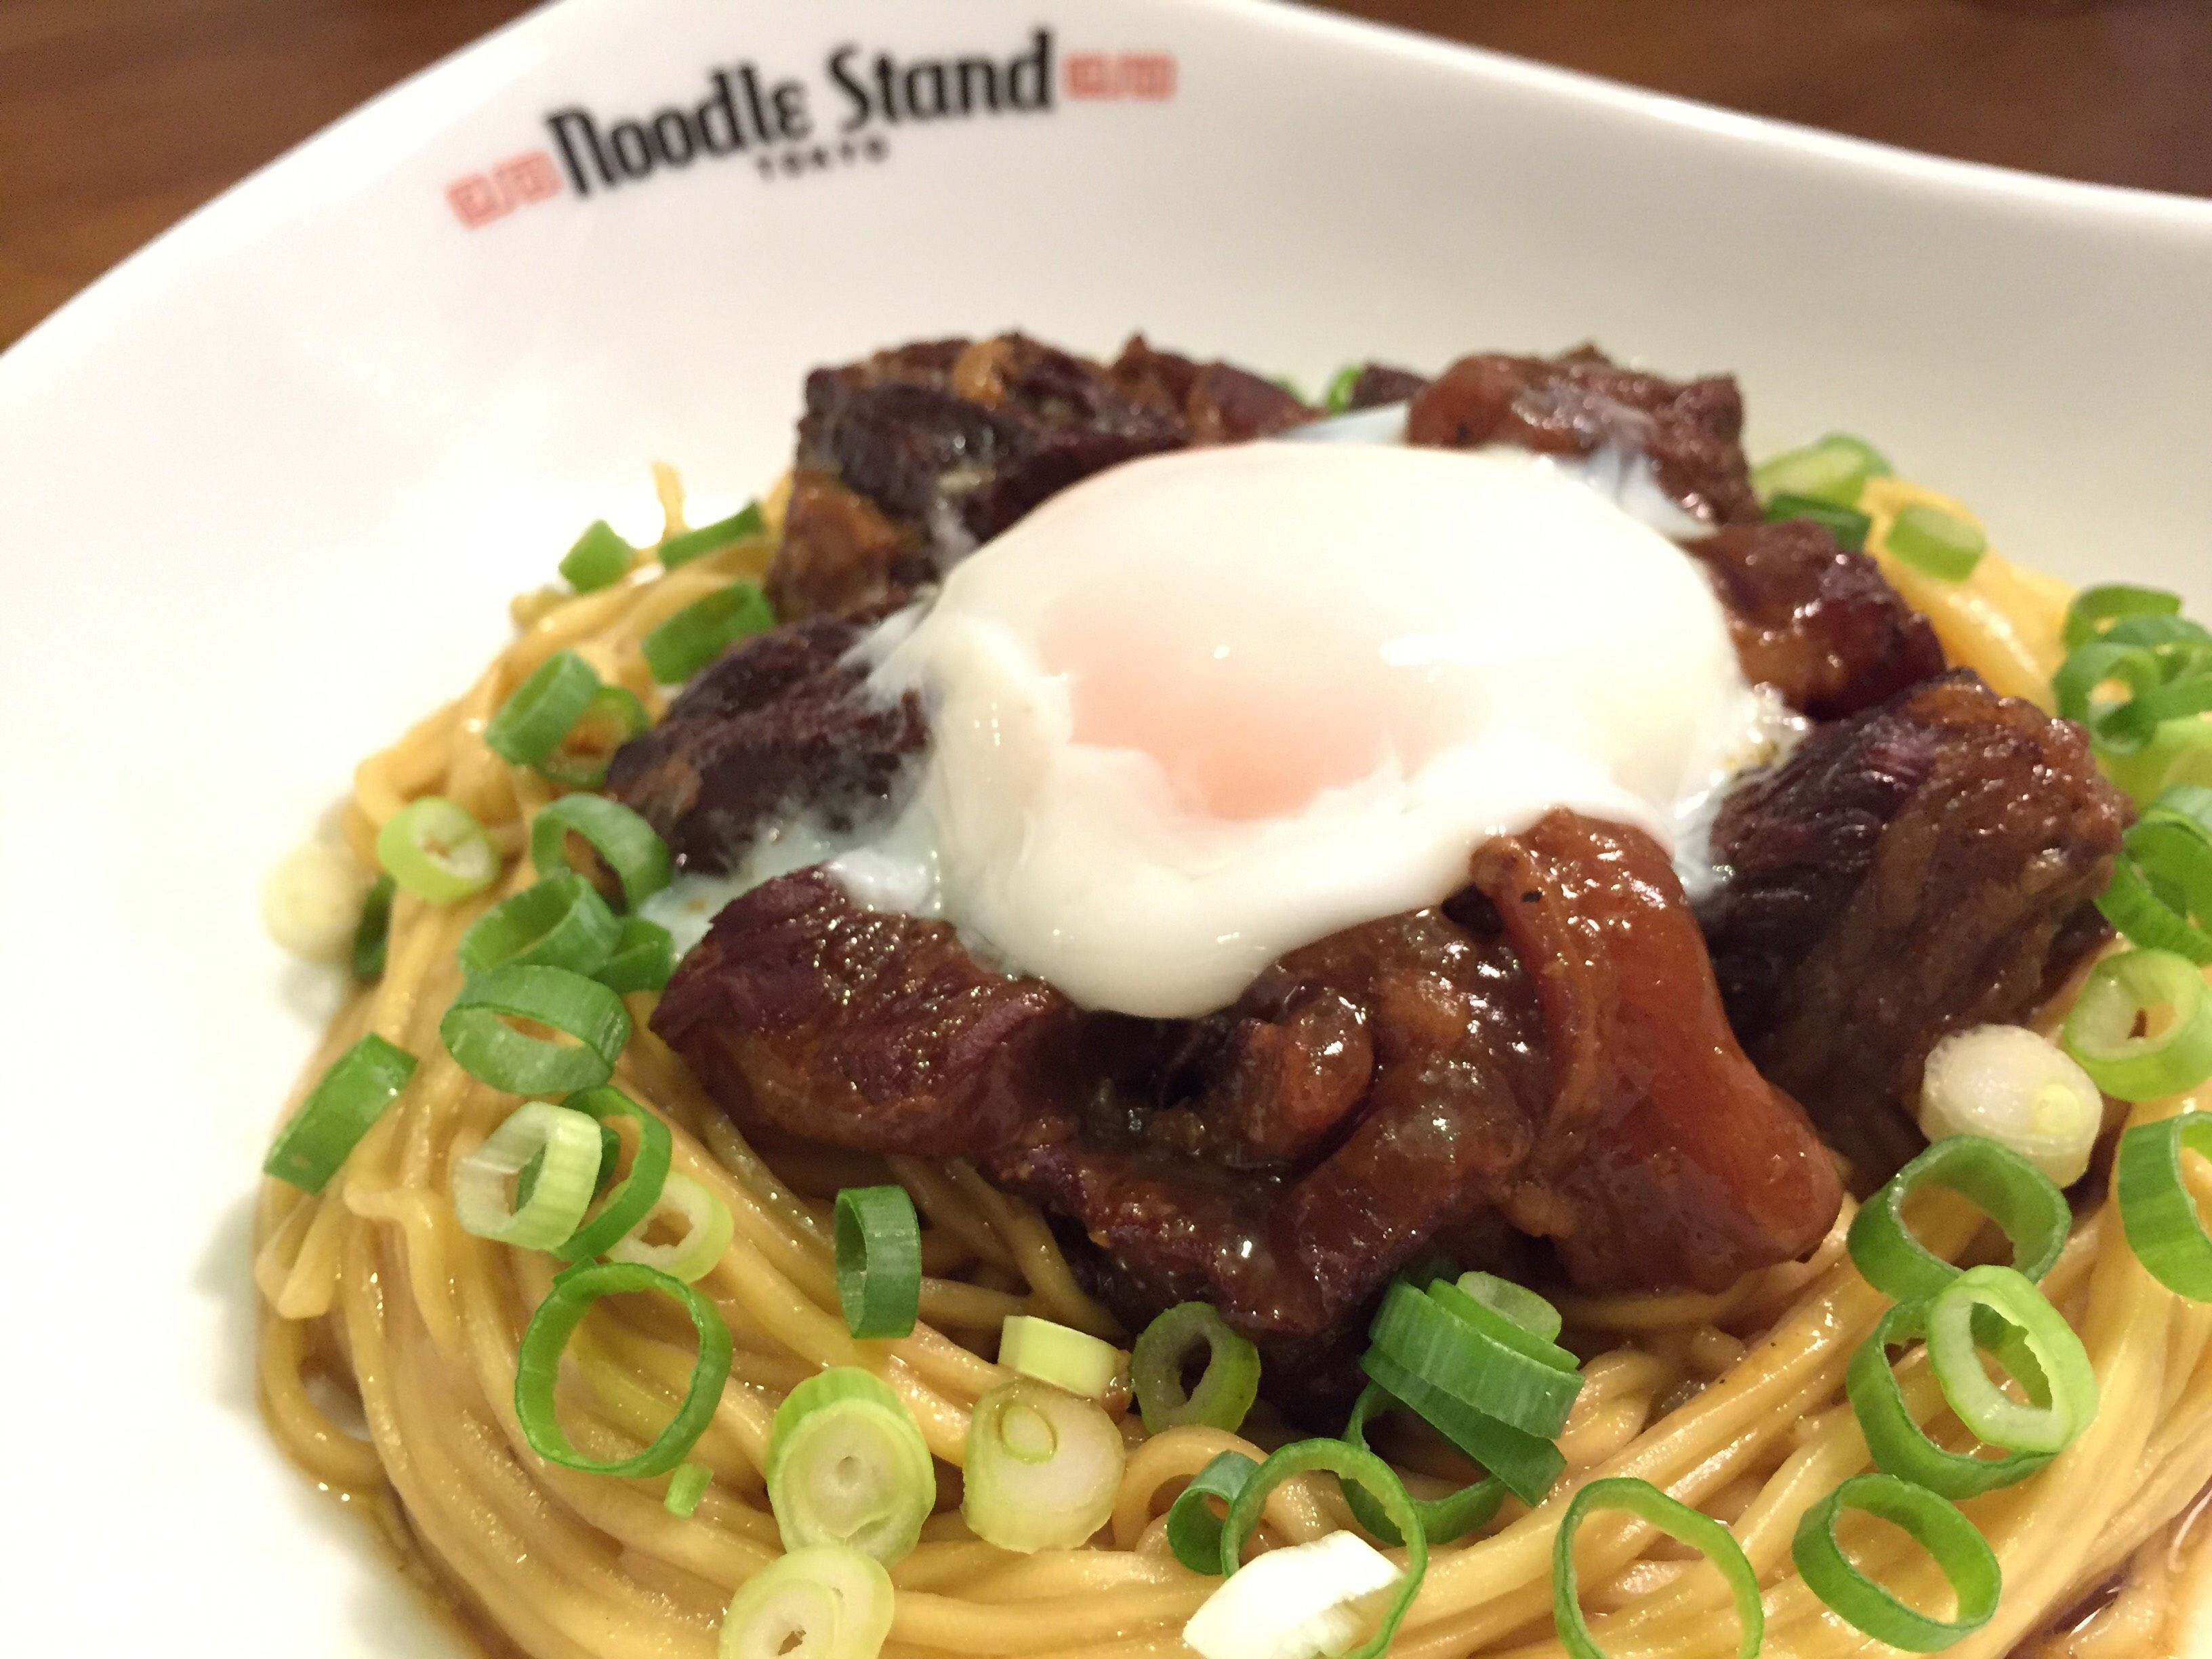 Creative Ramen Everyone Can Enjoy - Noodle Stand Tokyo In Harajuku